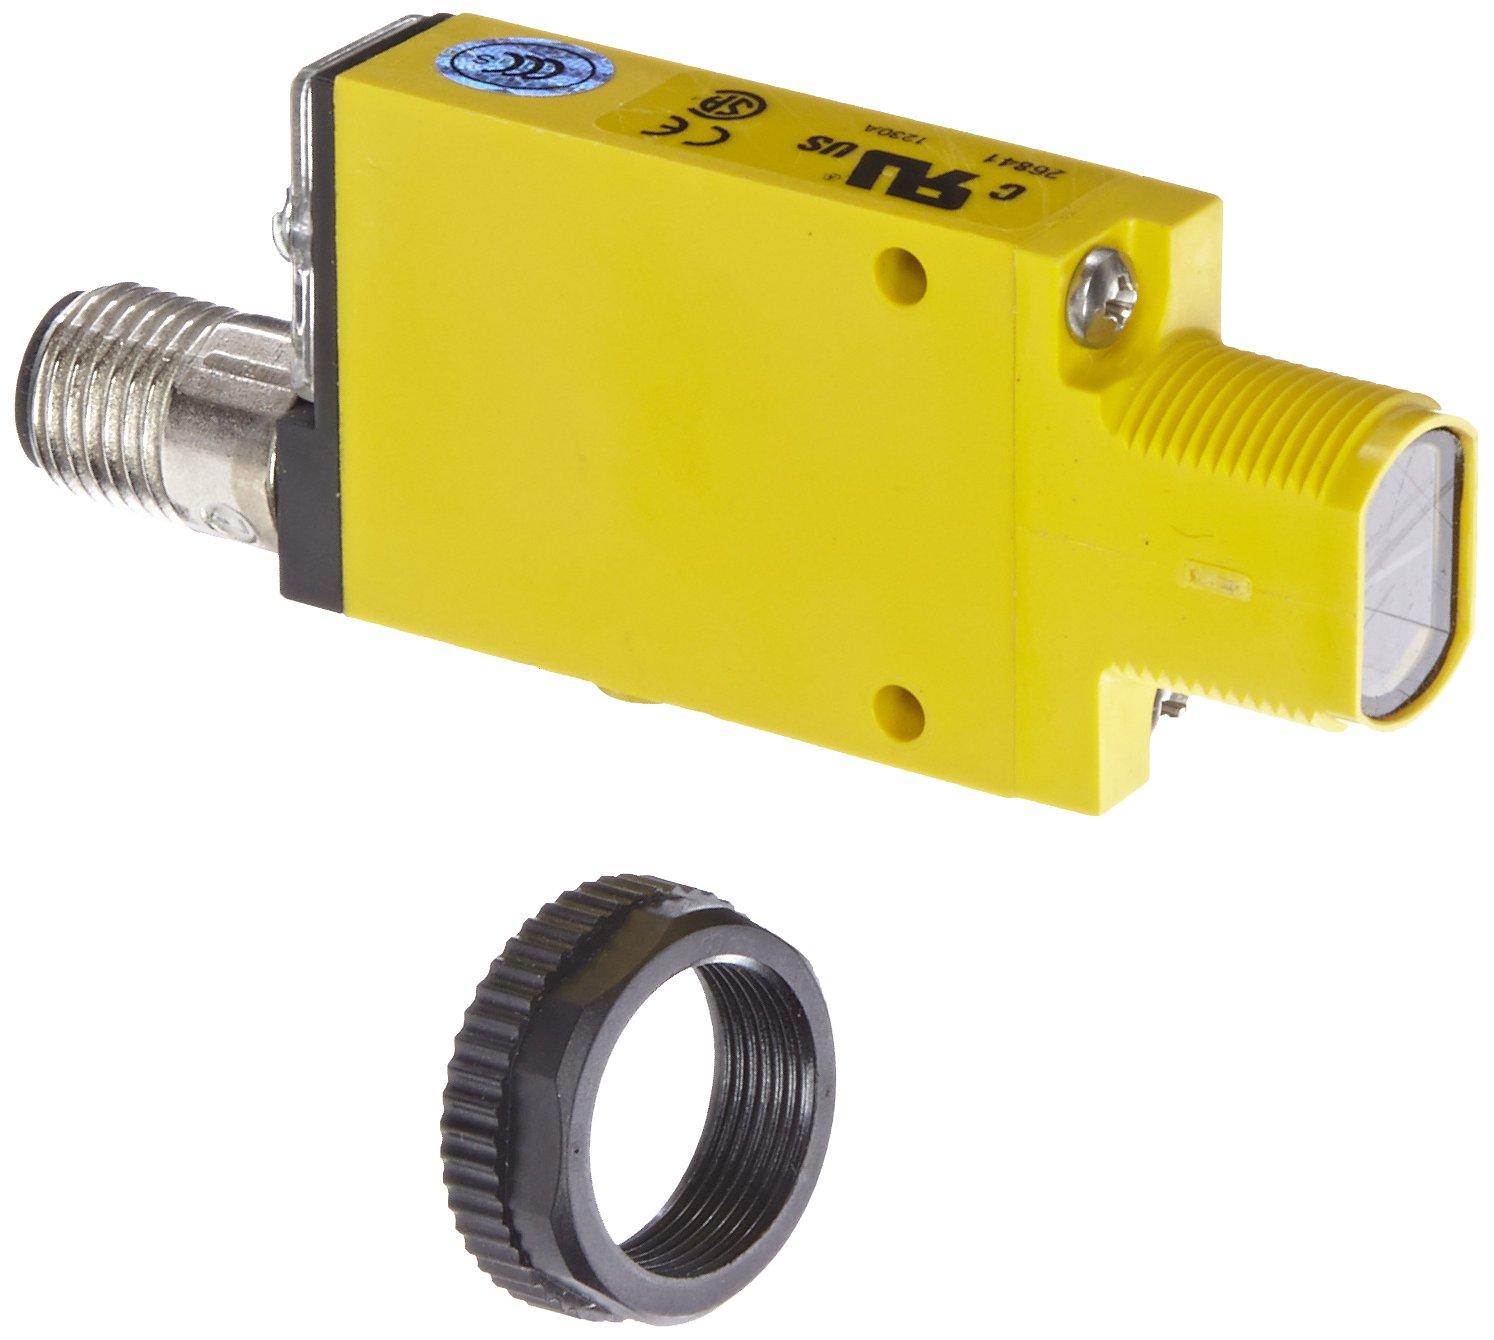 Banner SM2A312DQD Mini Beam AC Photoelectric Sensor, Infrared LED, Diffuse Mode, 380mm Range